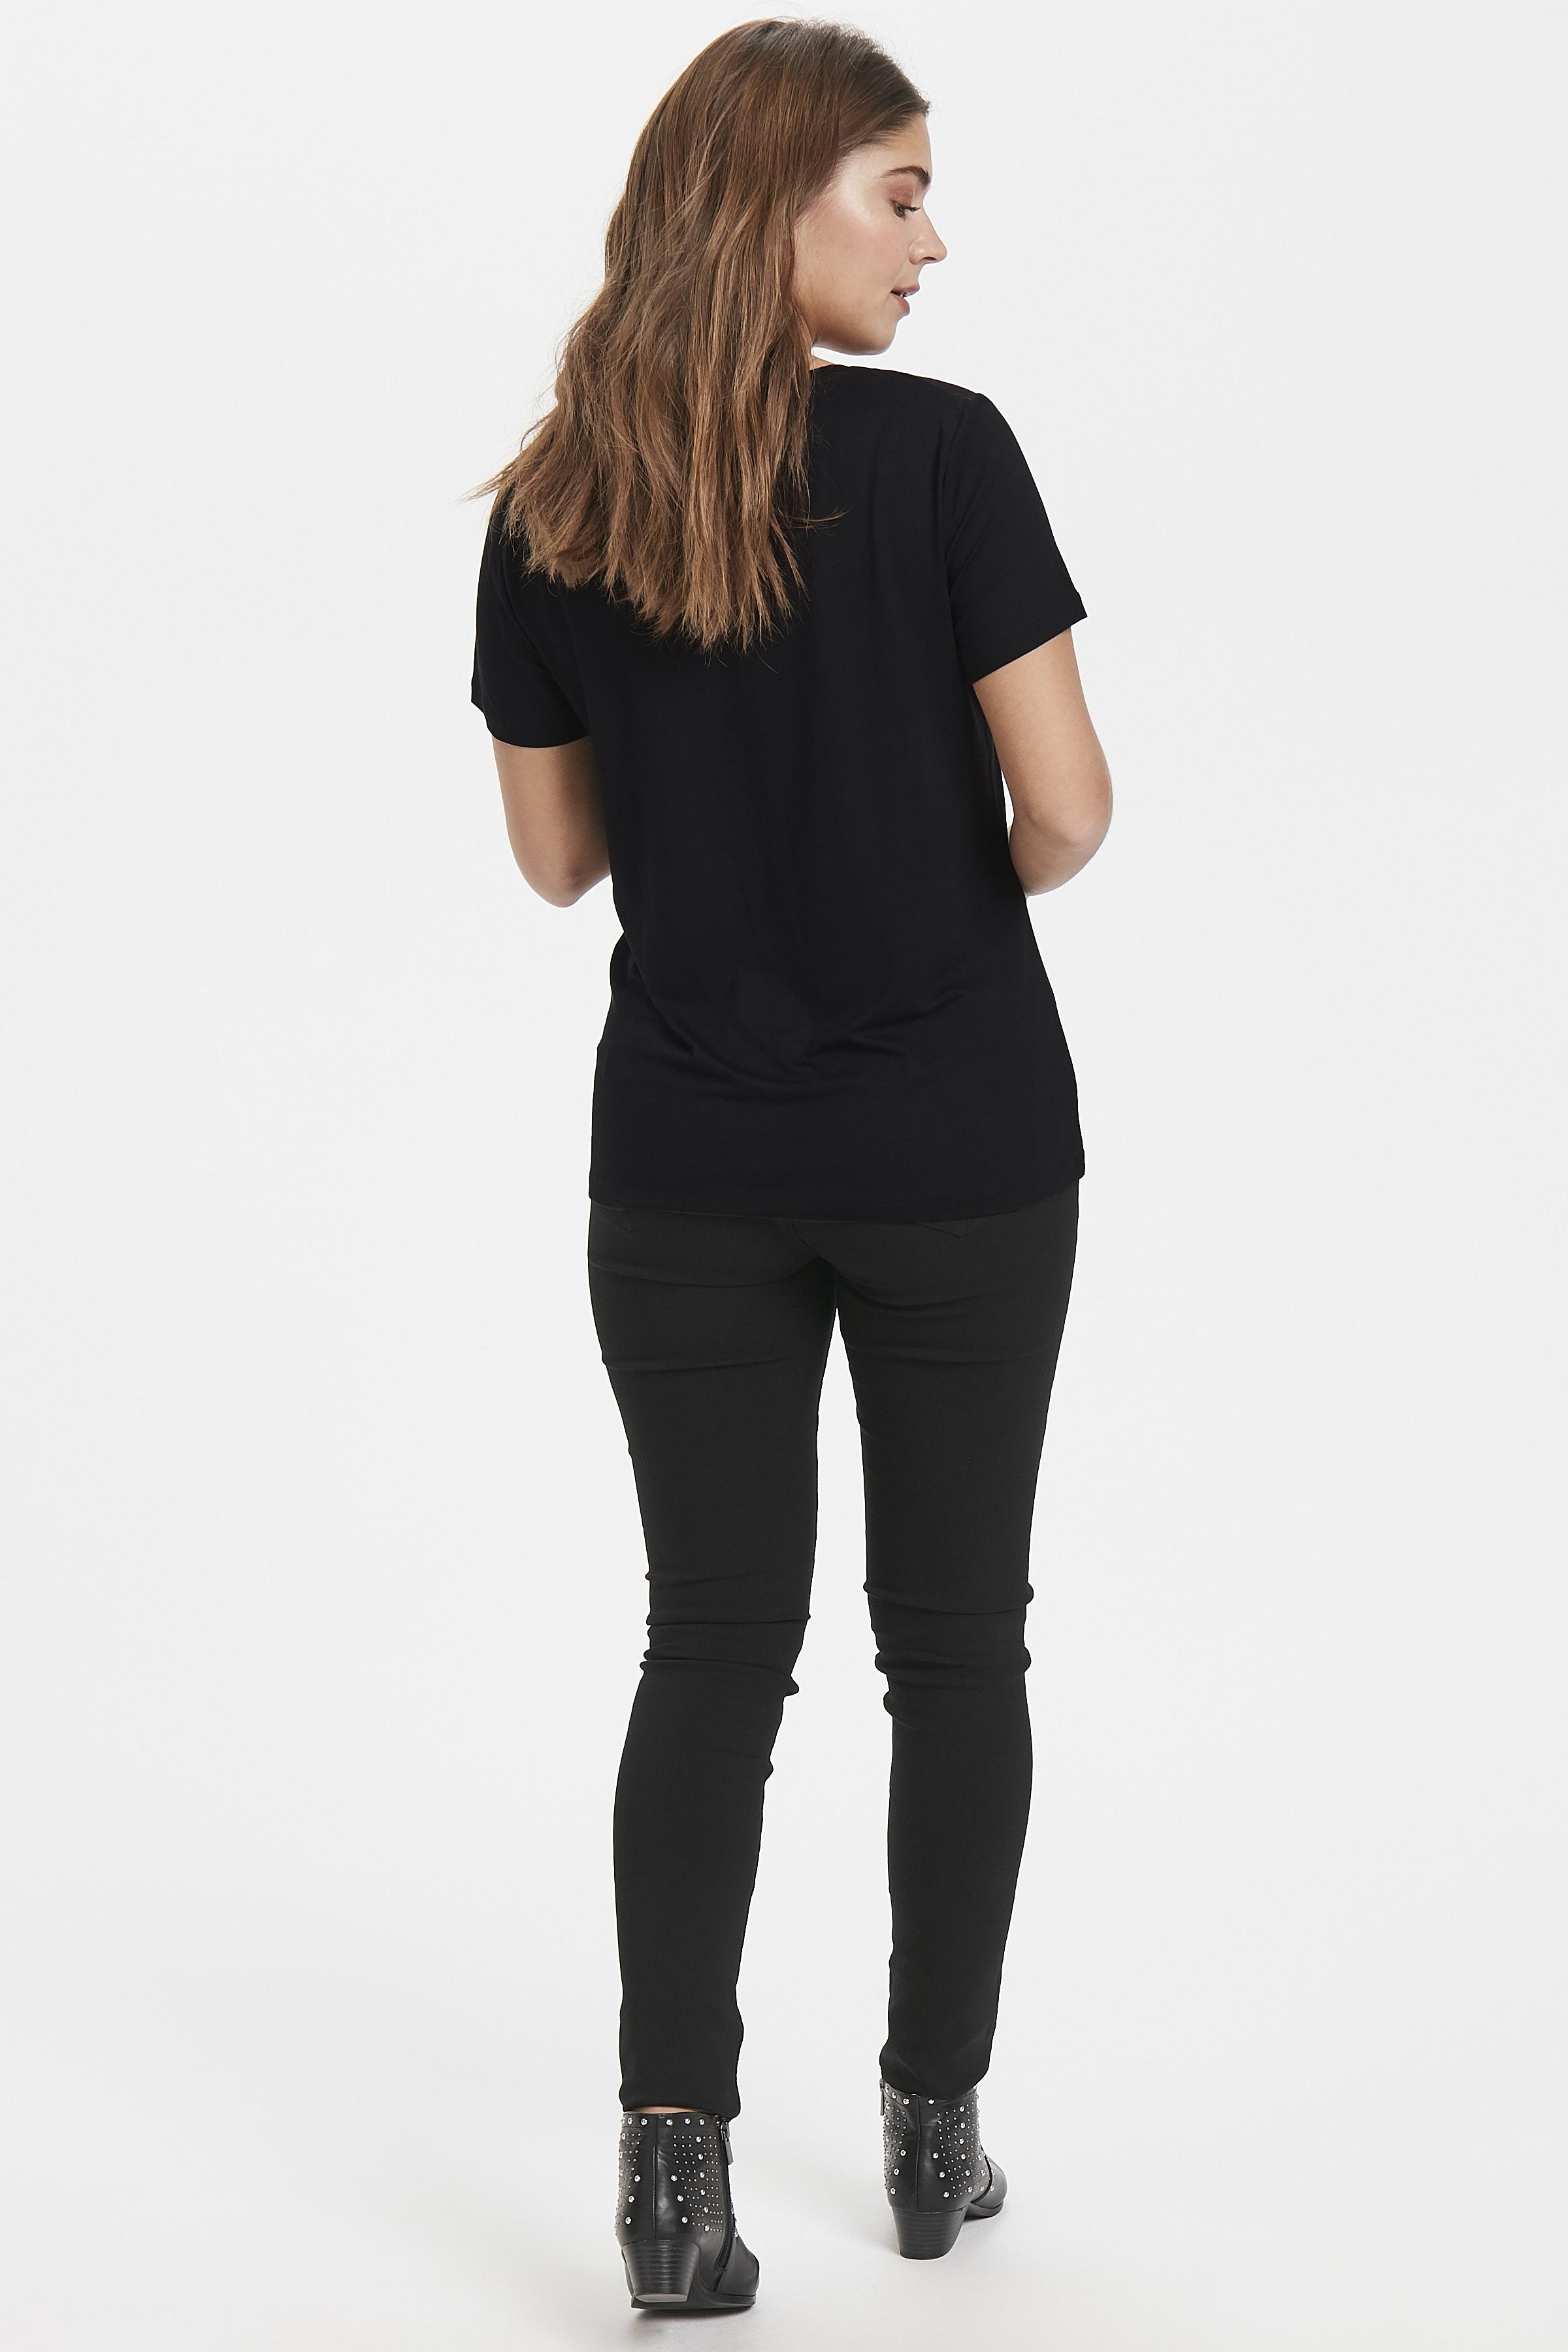 Black T-shirt fra b.young – Køb Black T-shirt fra str. XS-XL her